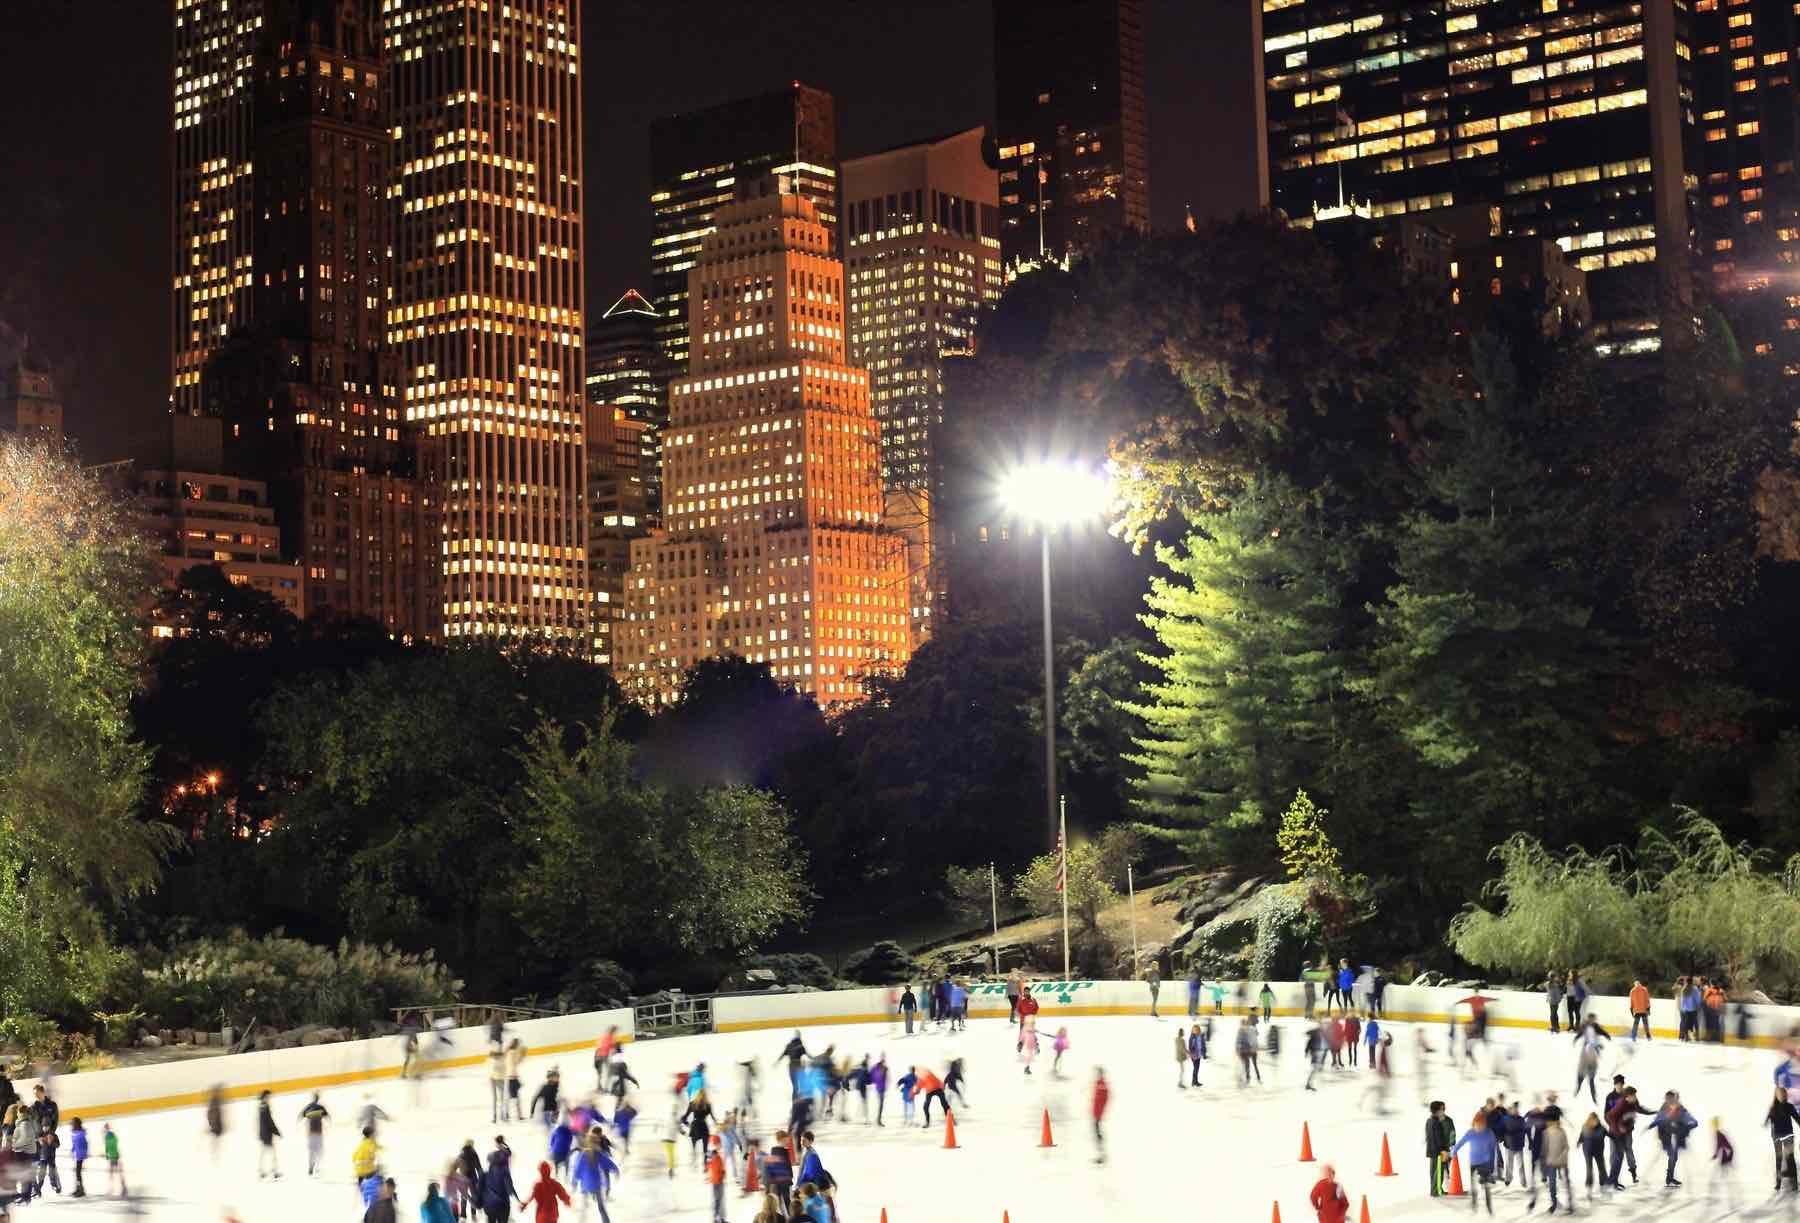 wollman rink at night central park manhattan new york city ny